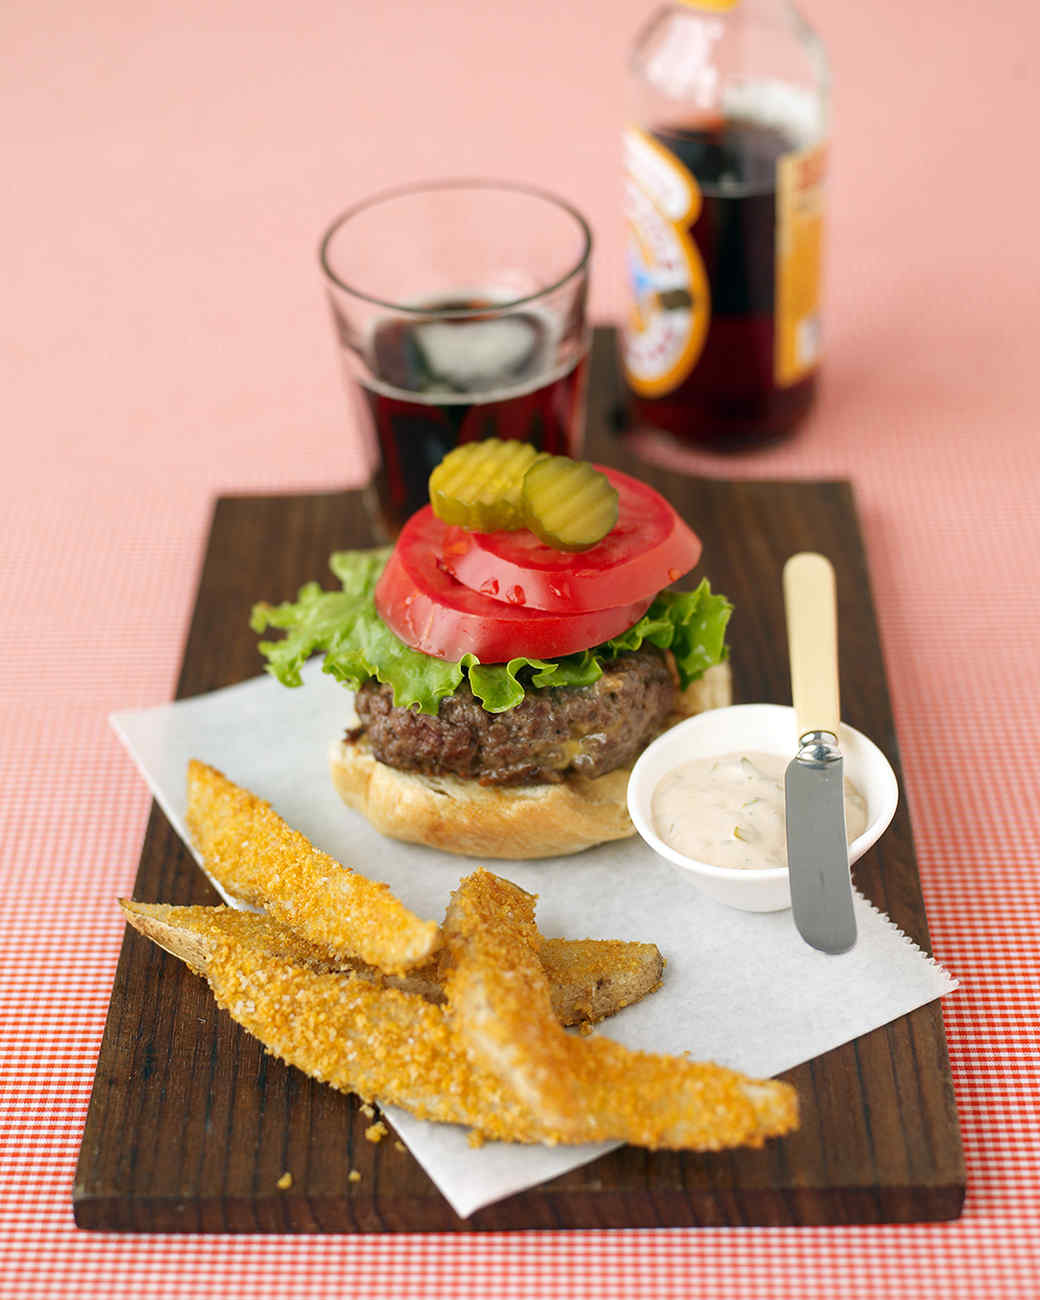 edf_oct06_meat_burger.jpg